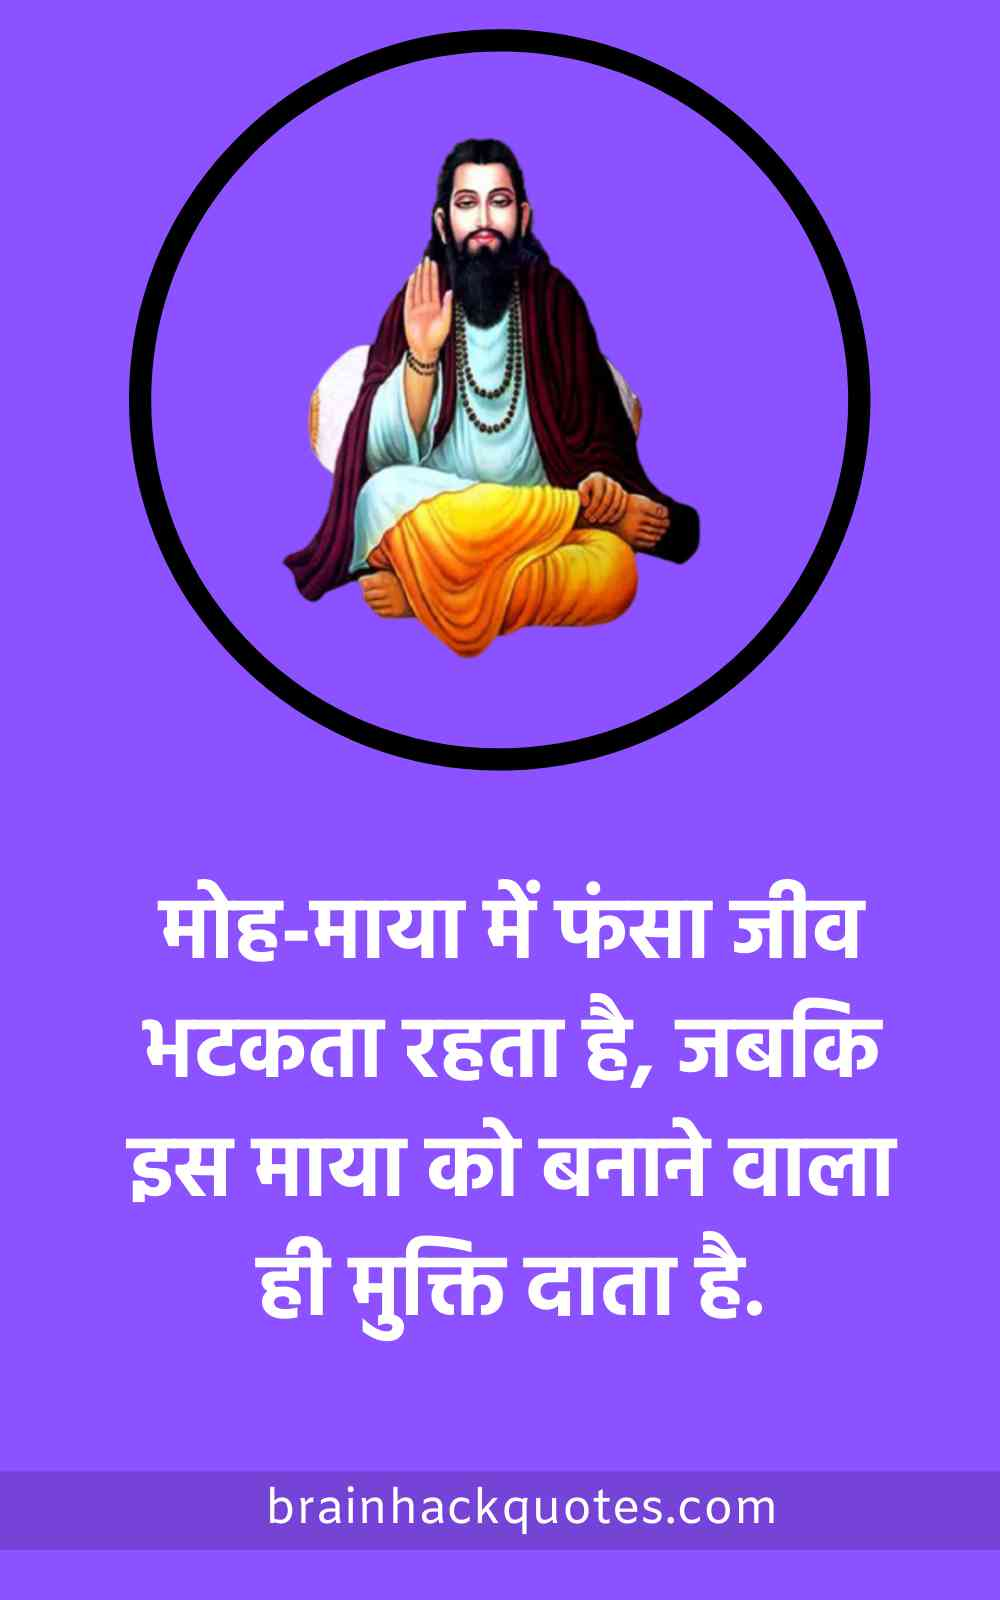 Sant Ravidas Jayanti Quotes, Wishes and Dohe in Hindi and English